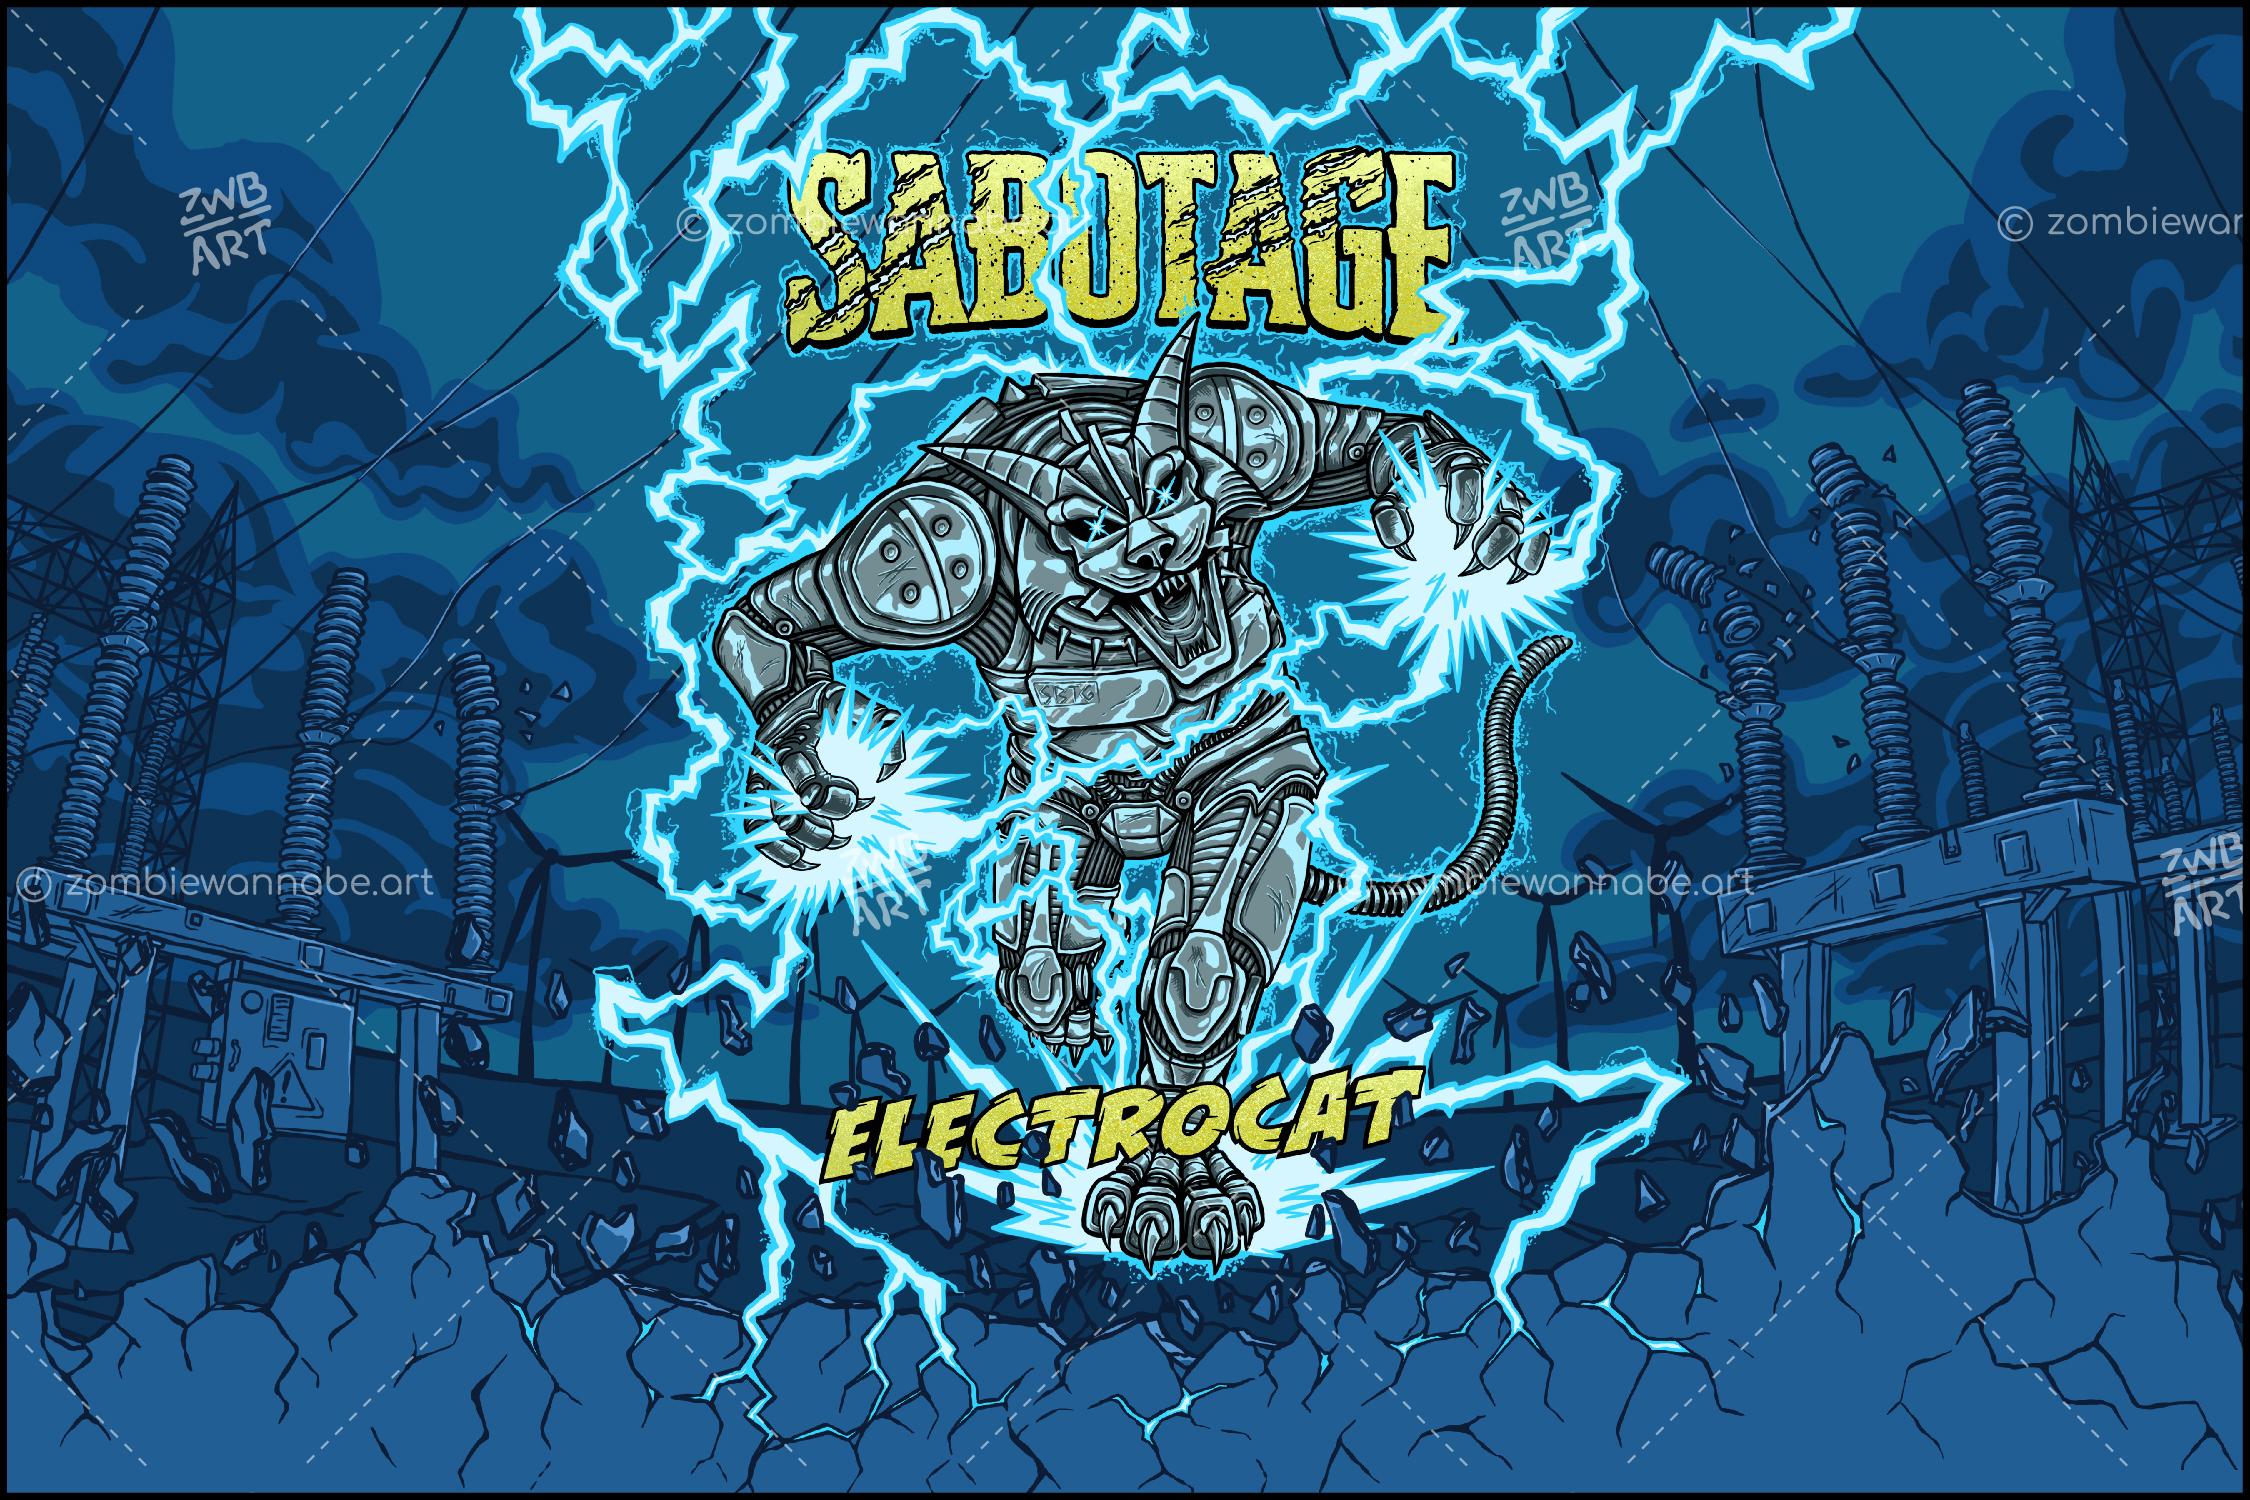 Sabotage - Electrocat - commissioned work